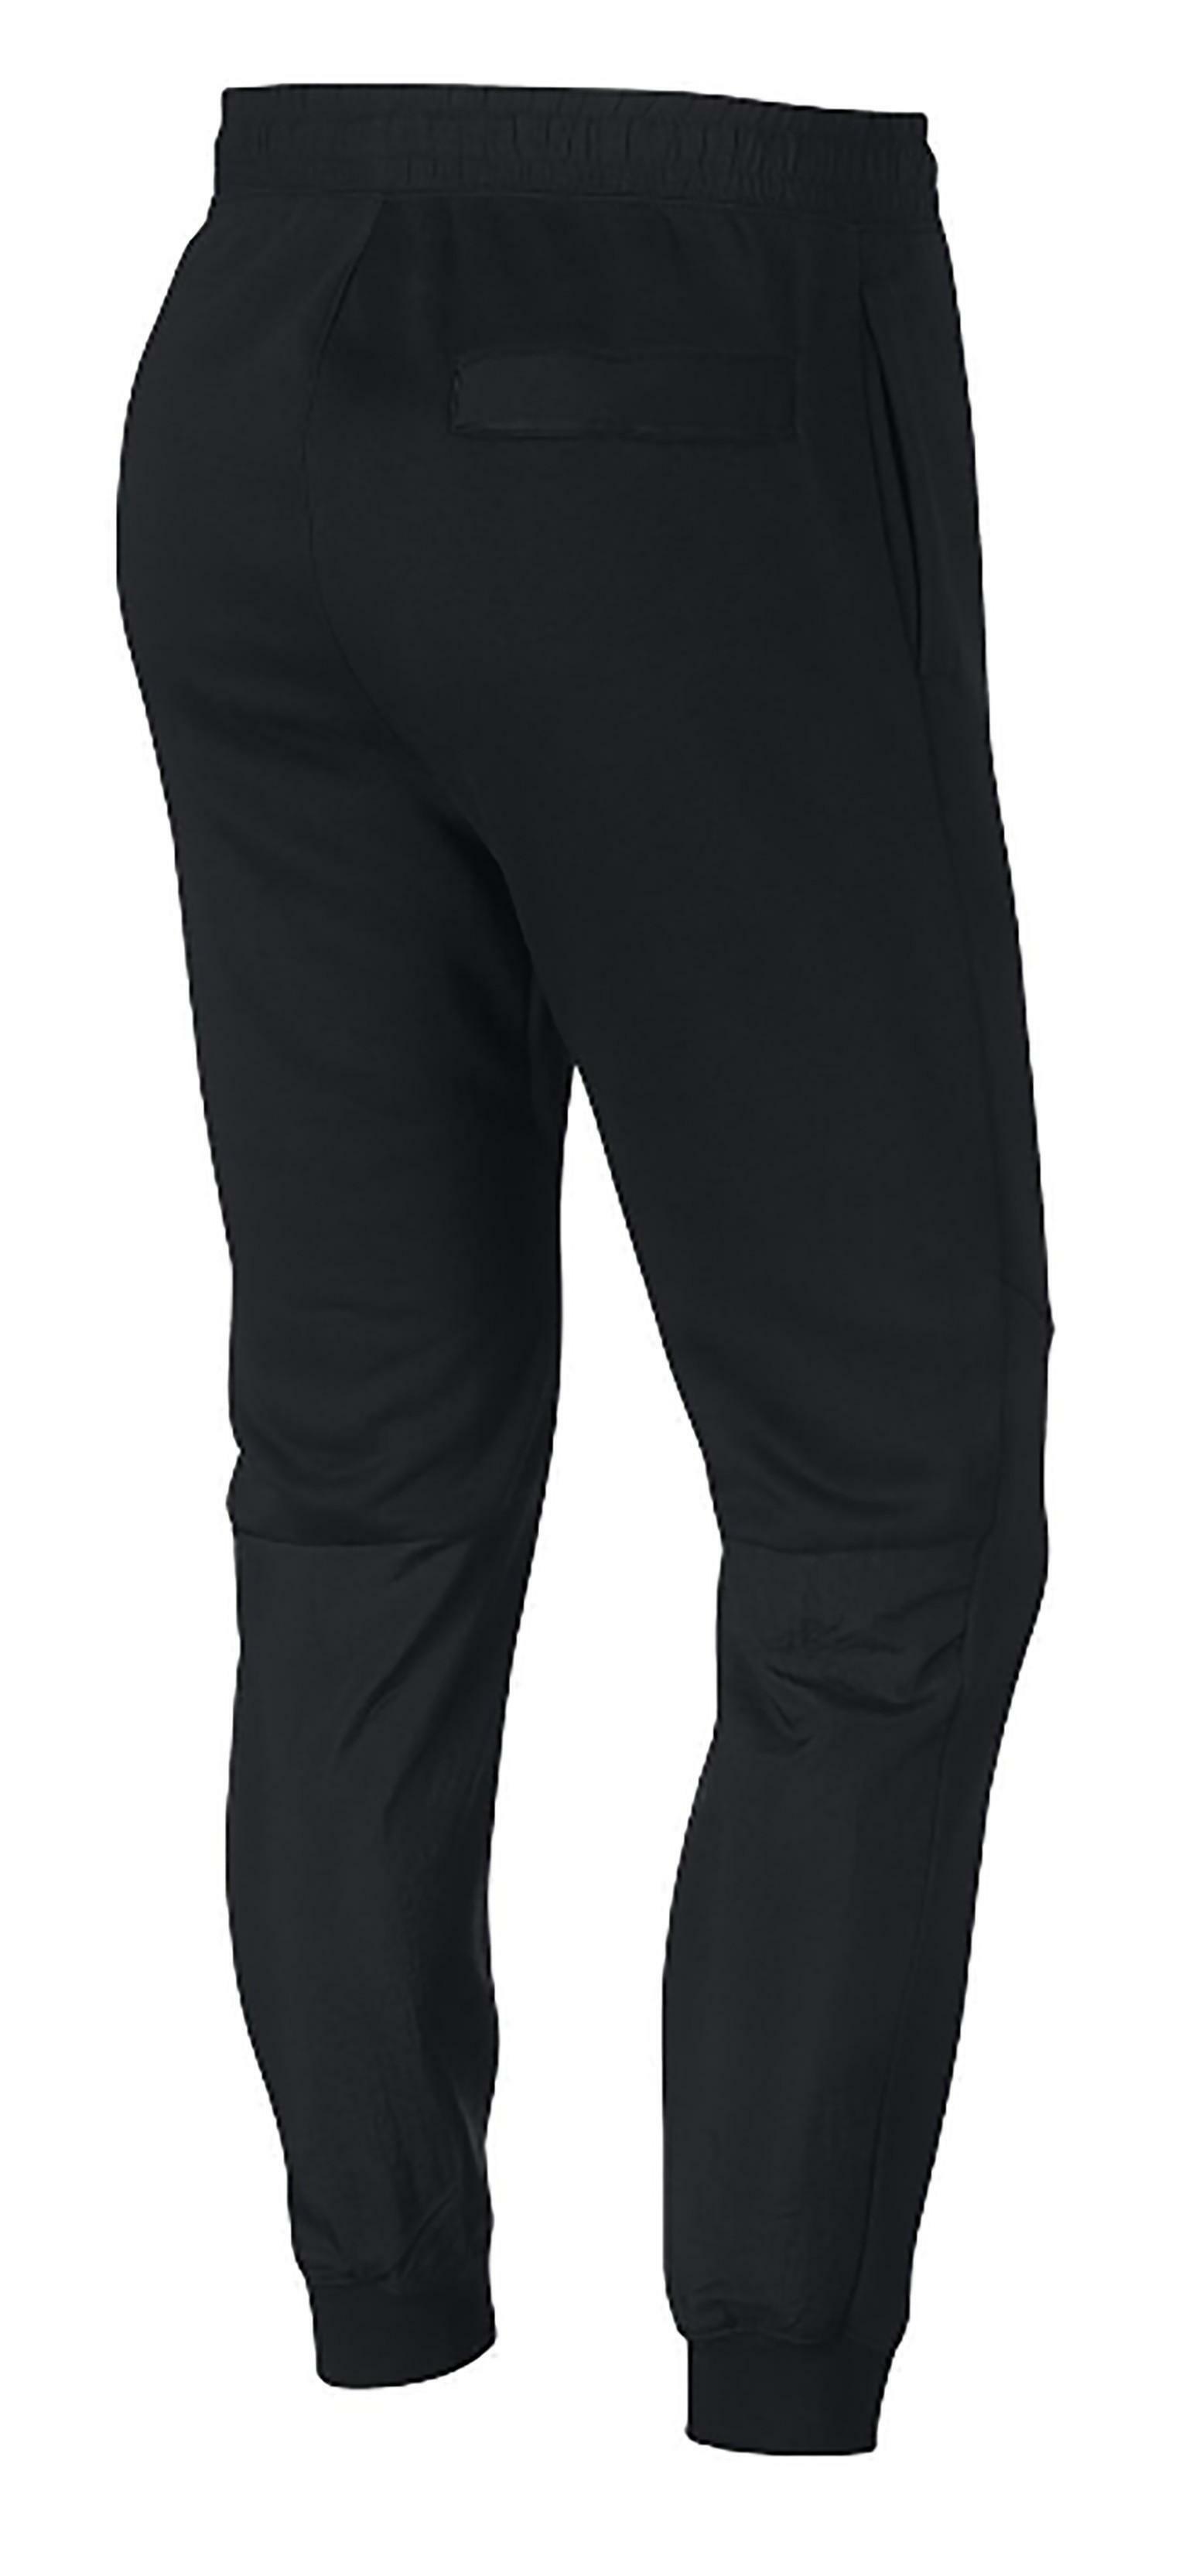 Nike just do it pantalone felpato uomo neri 931903010